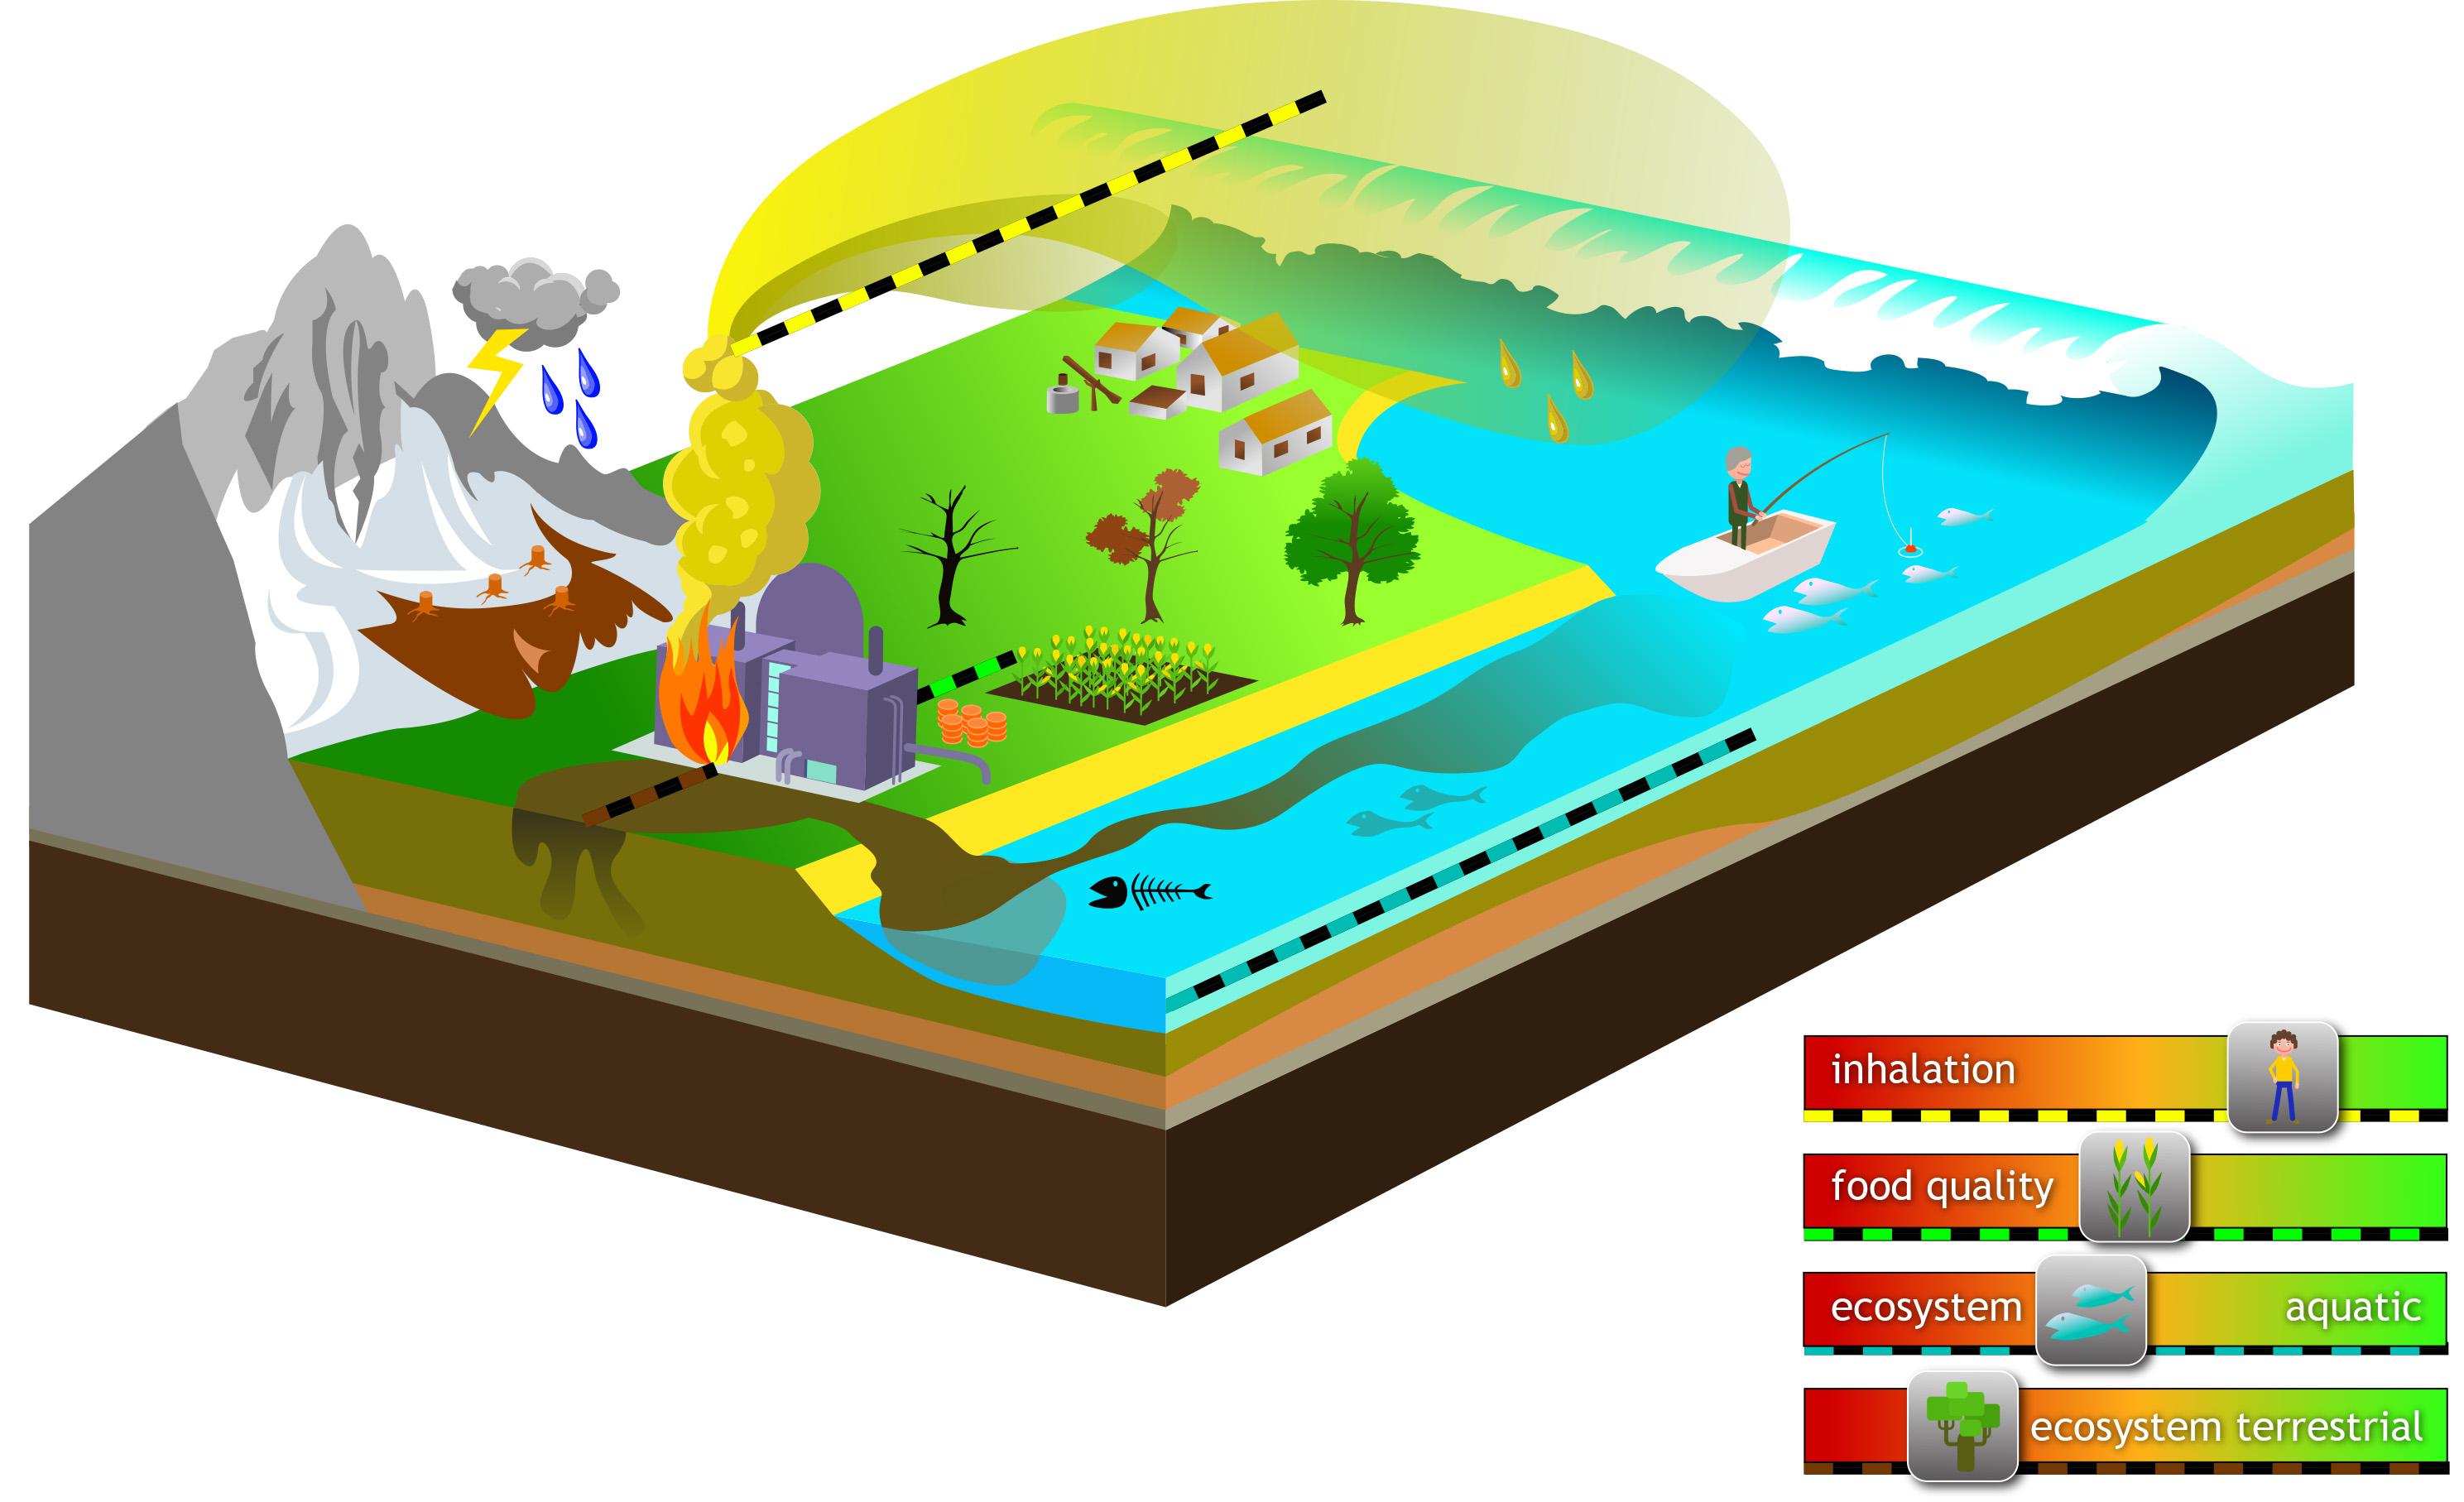 Vervuilingsfaktoren